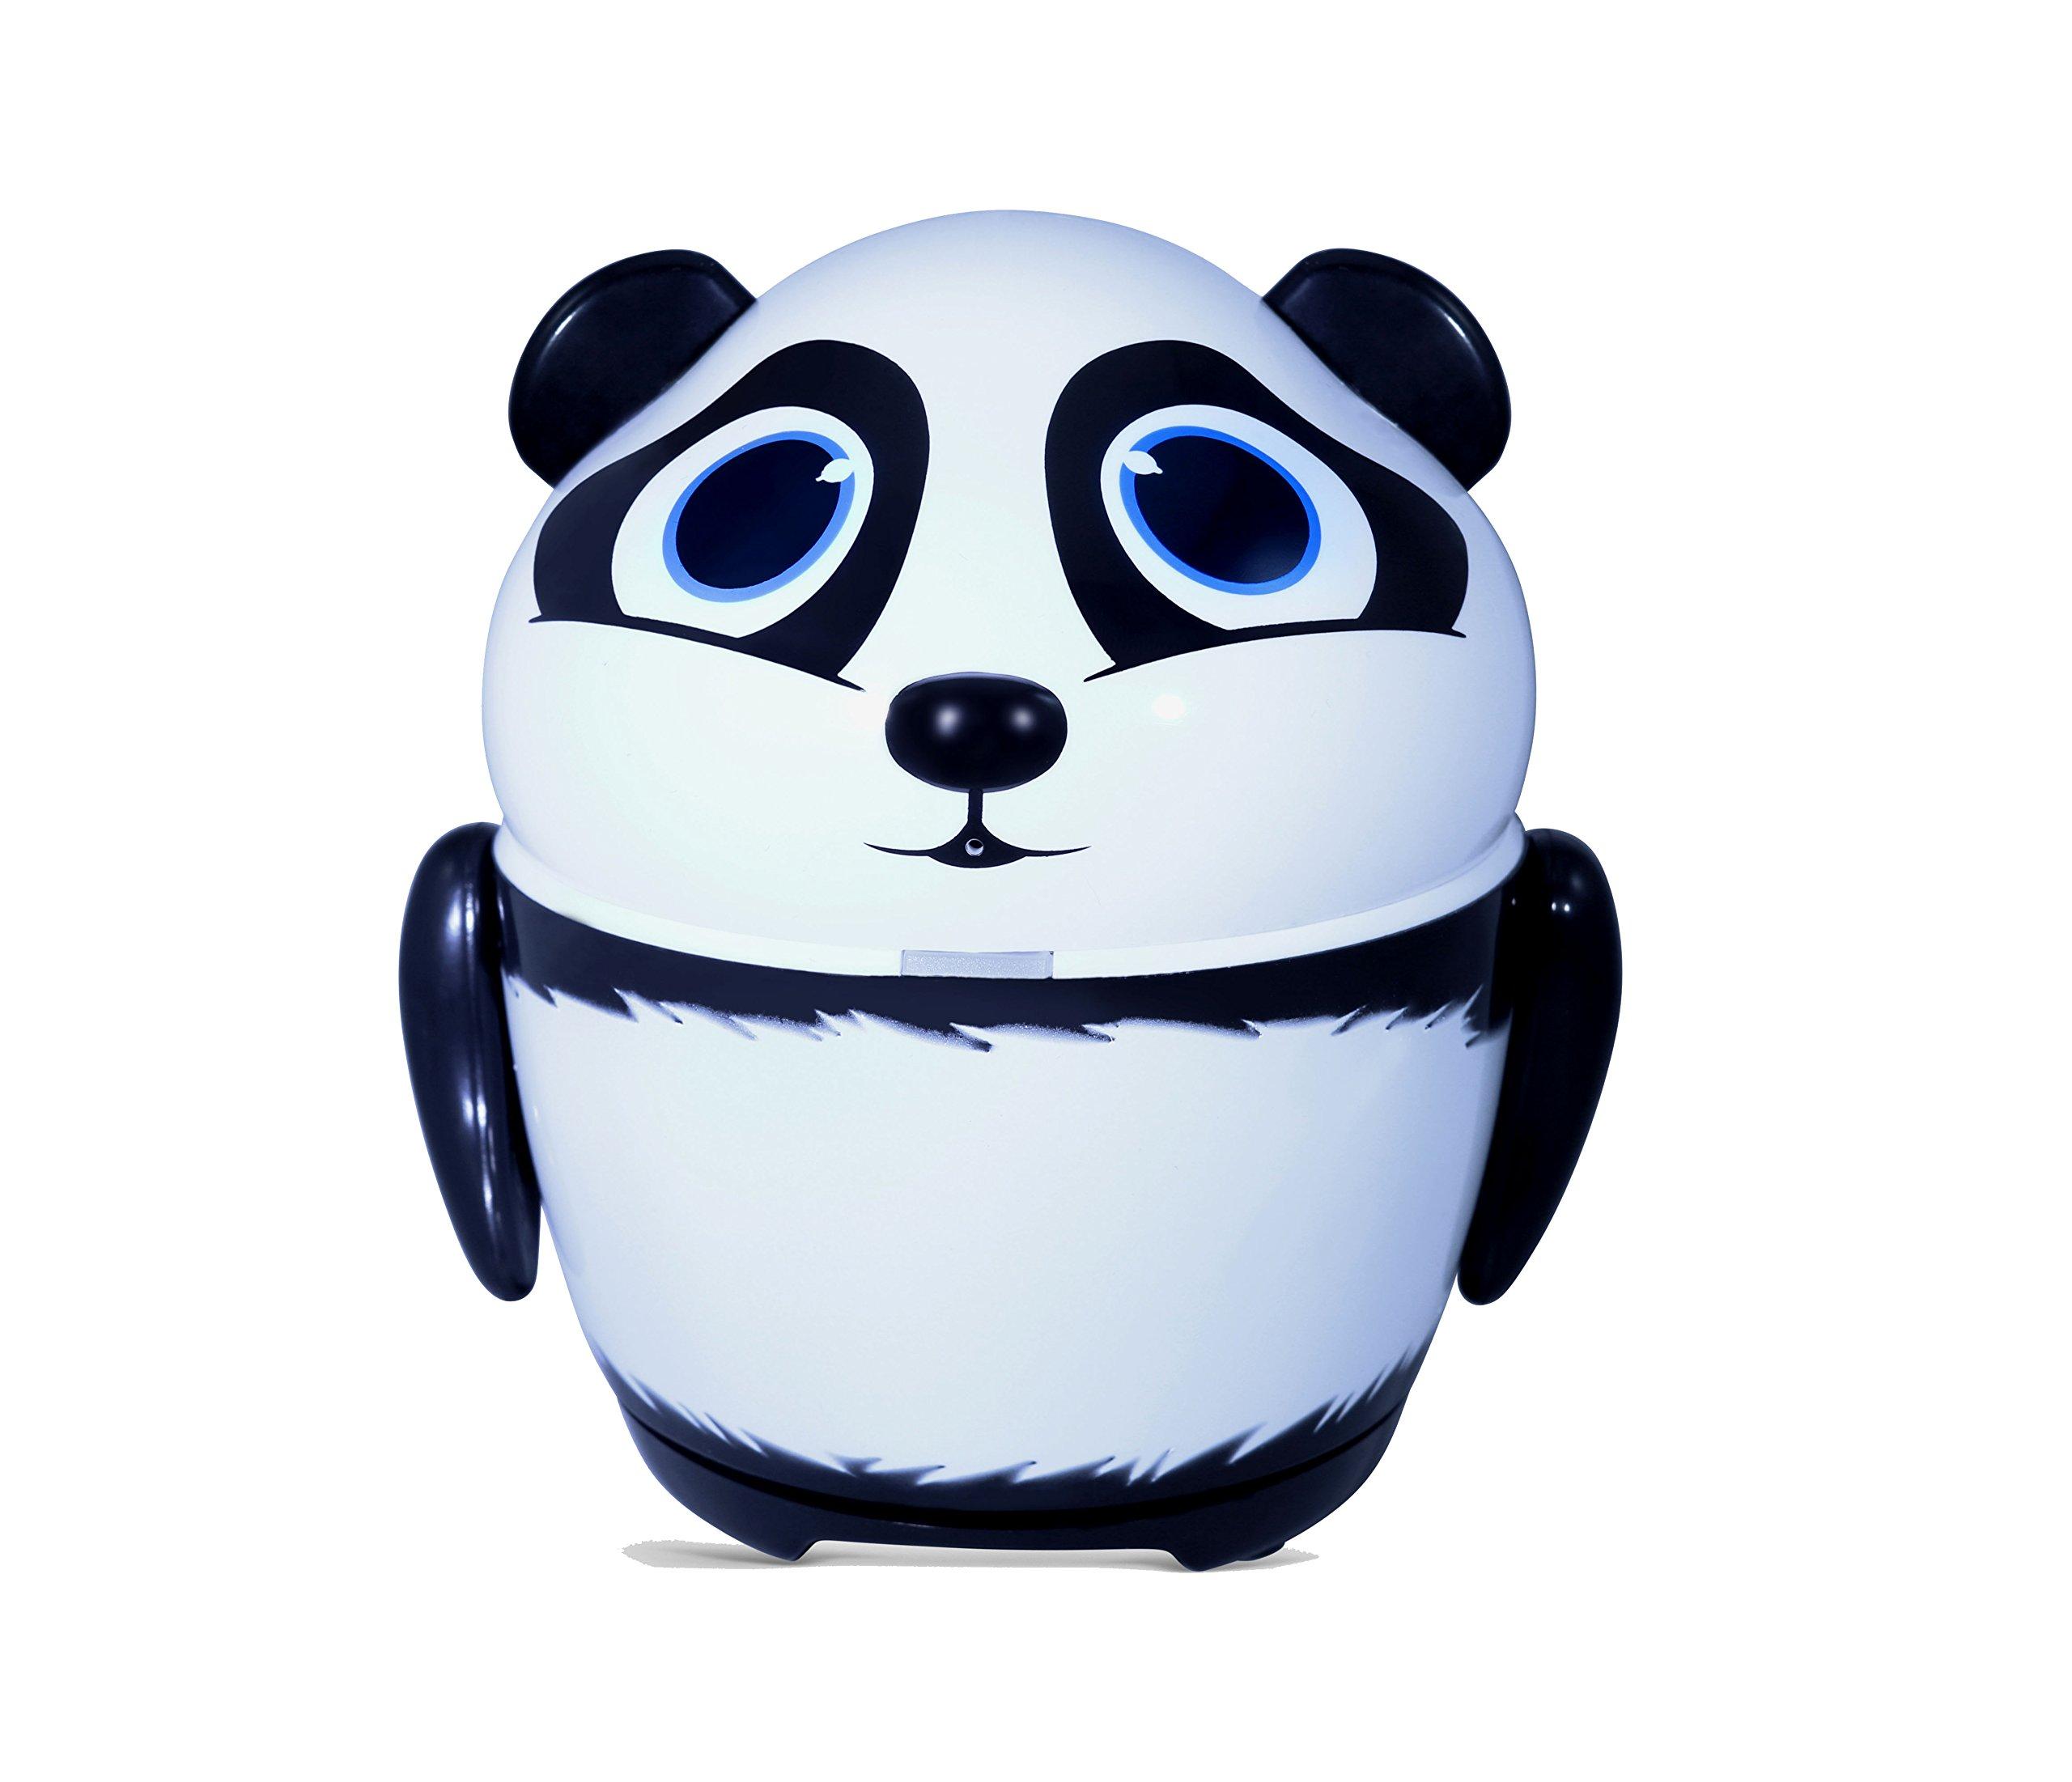 cute wireless speakers peyton panda bluetooth animal wireless speakers this cute pet blue tooth audio speaker is for portable